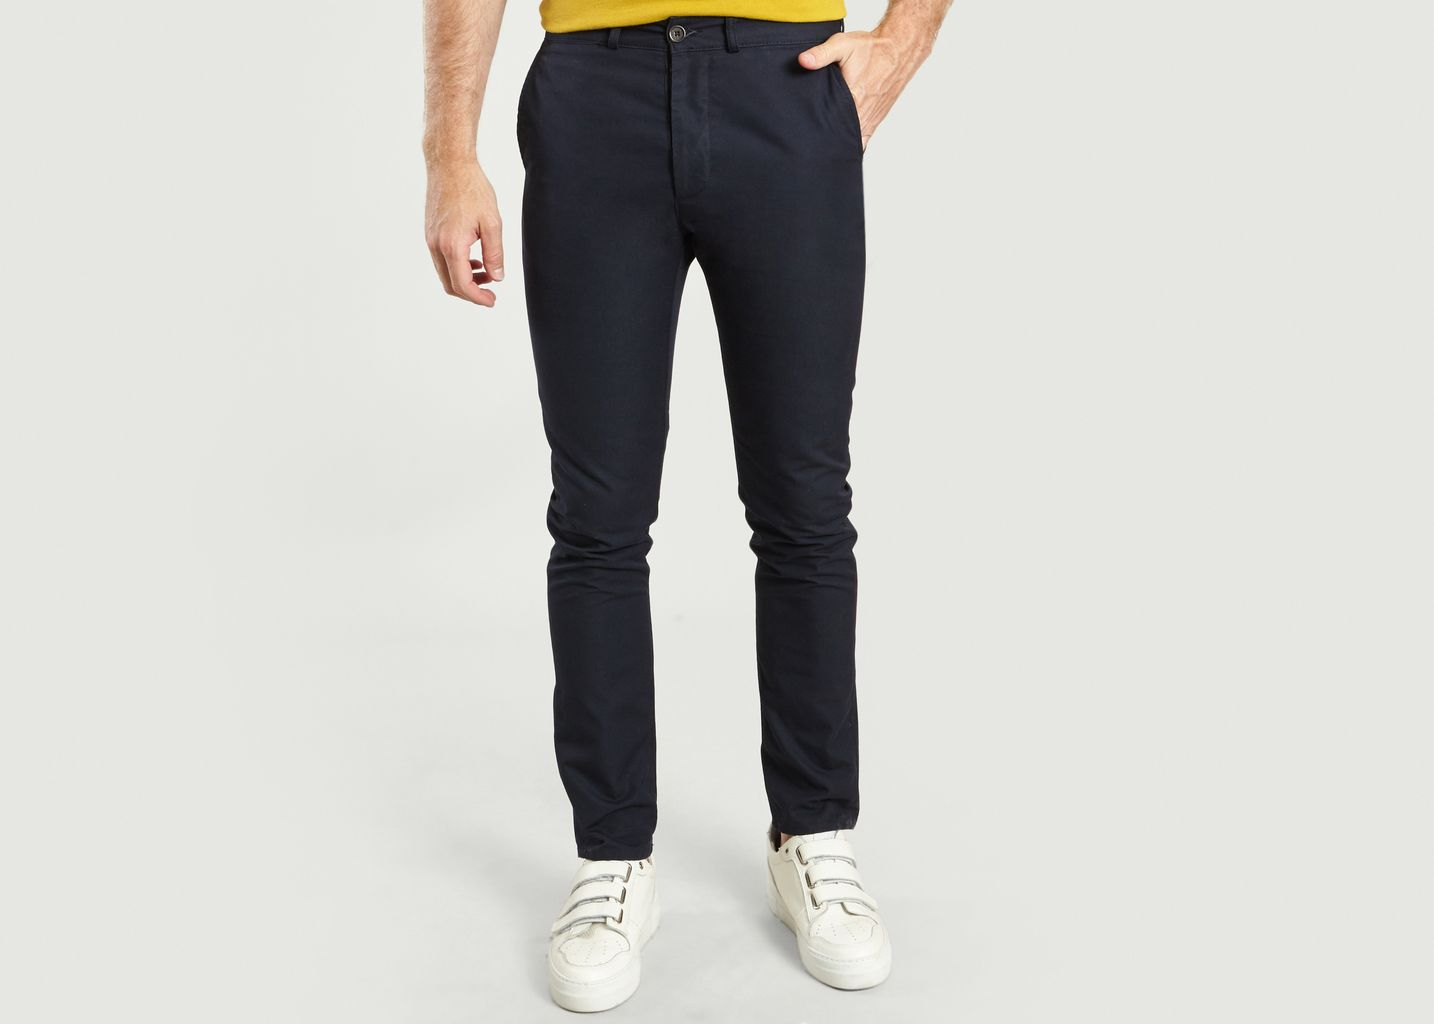 Pantalon Chino Parfait - Maison Kitsuné